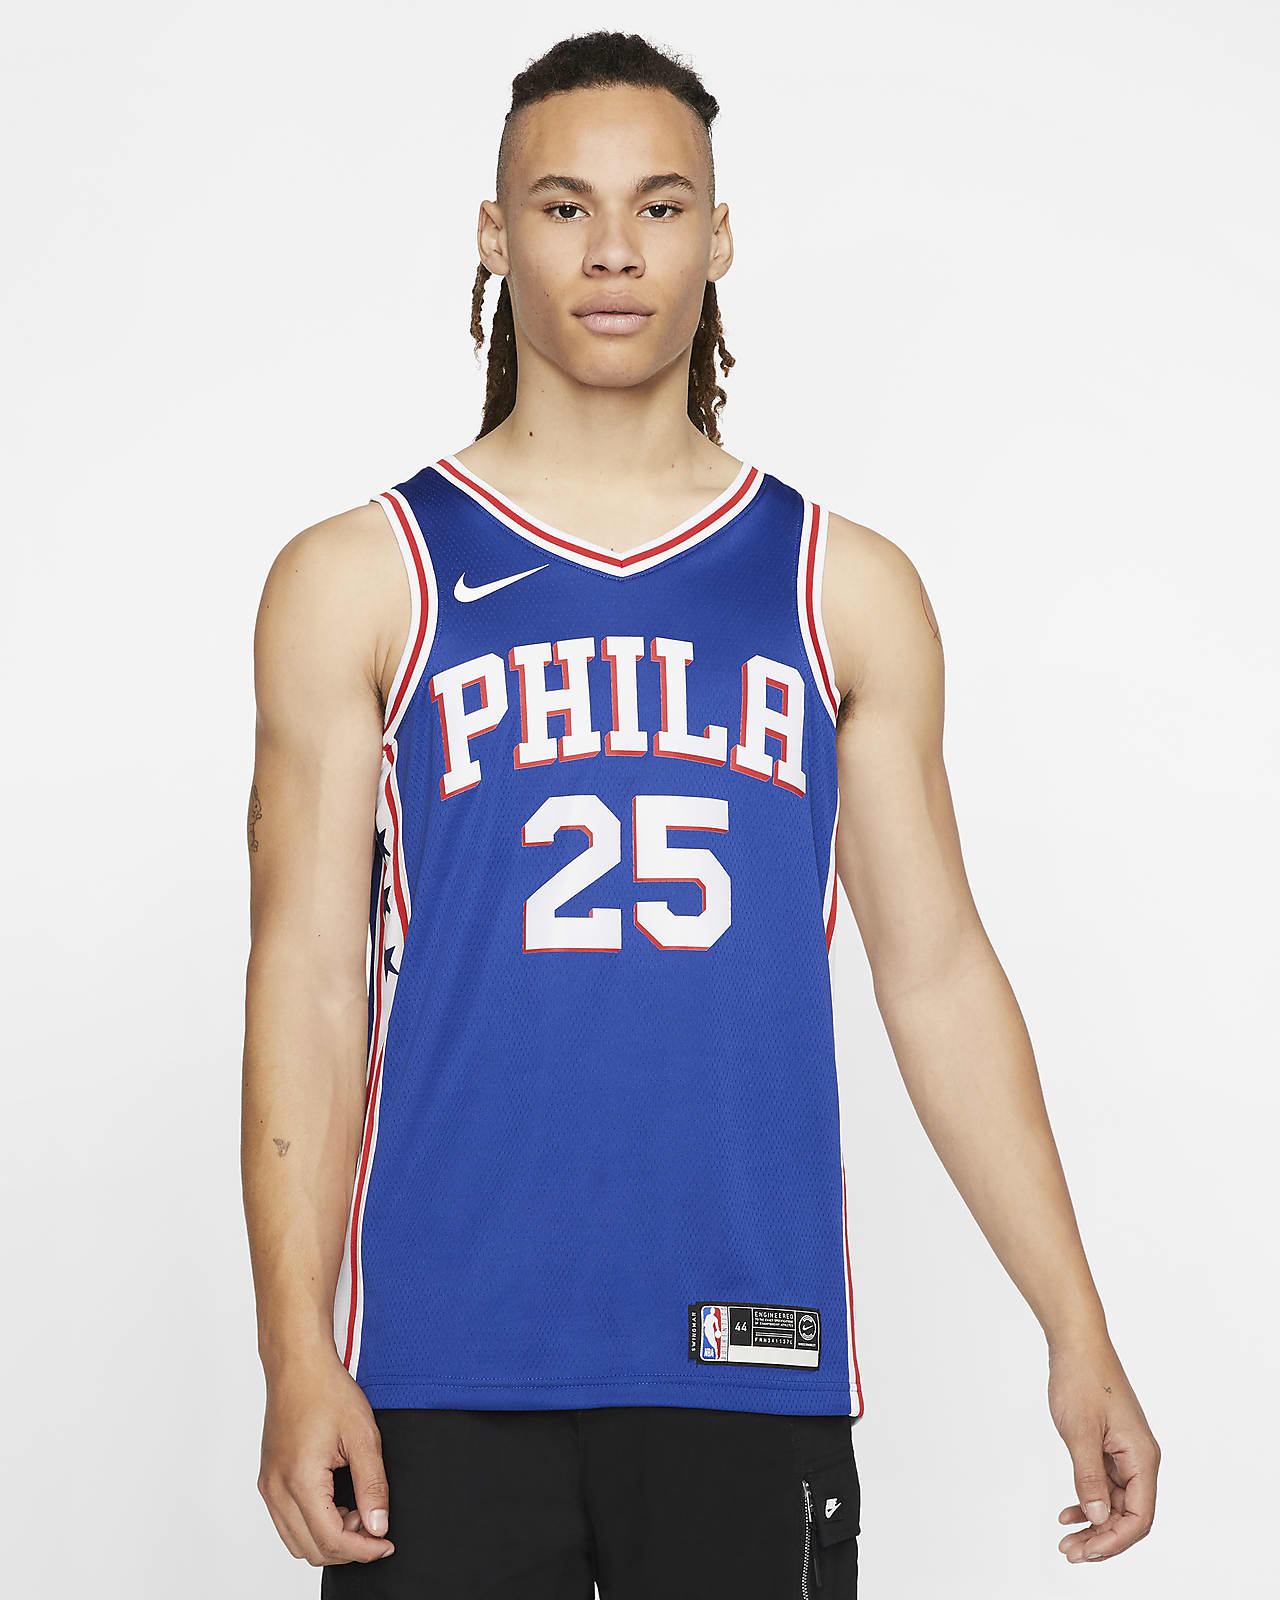 Camisola NBA da Nike Swingman Ben Simmons 76ers Icon Edition